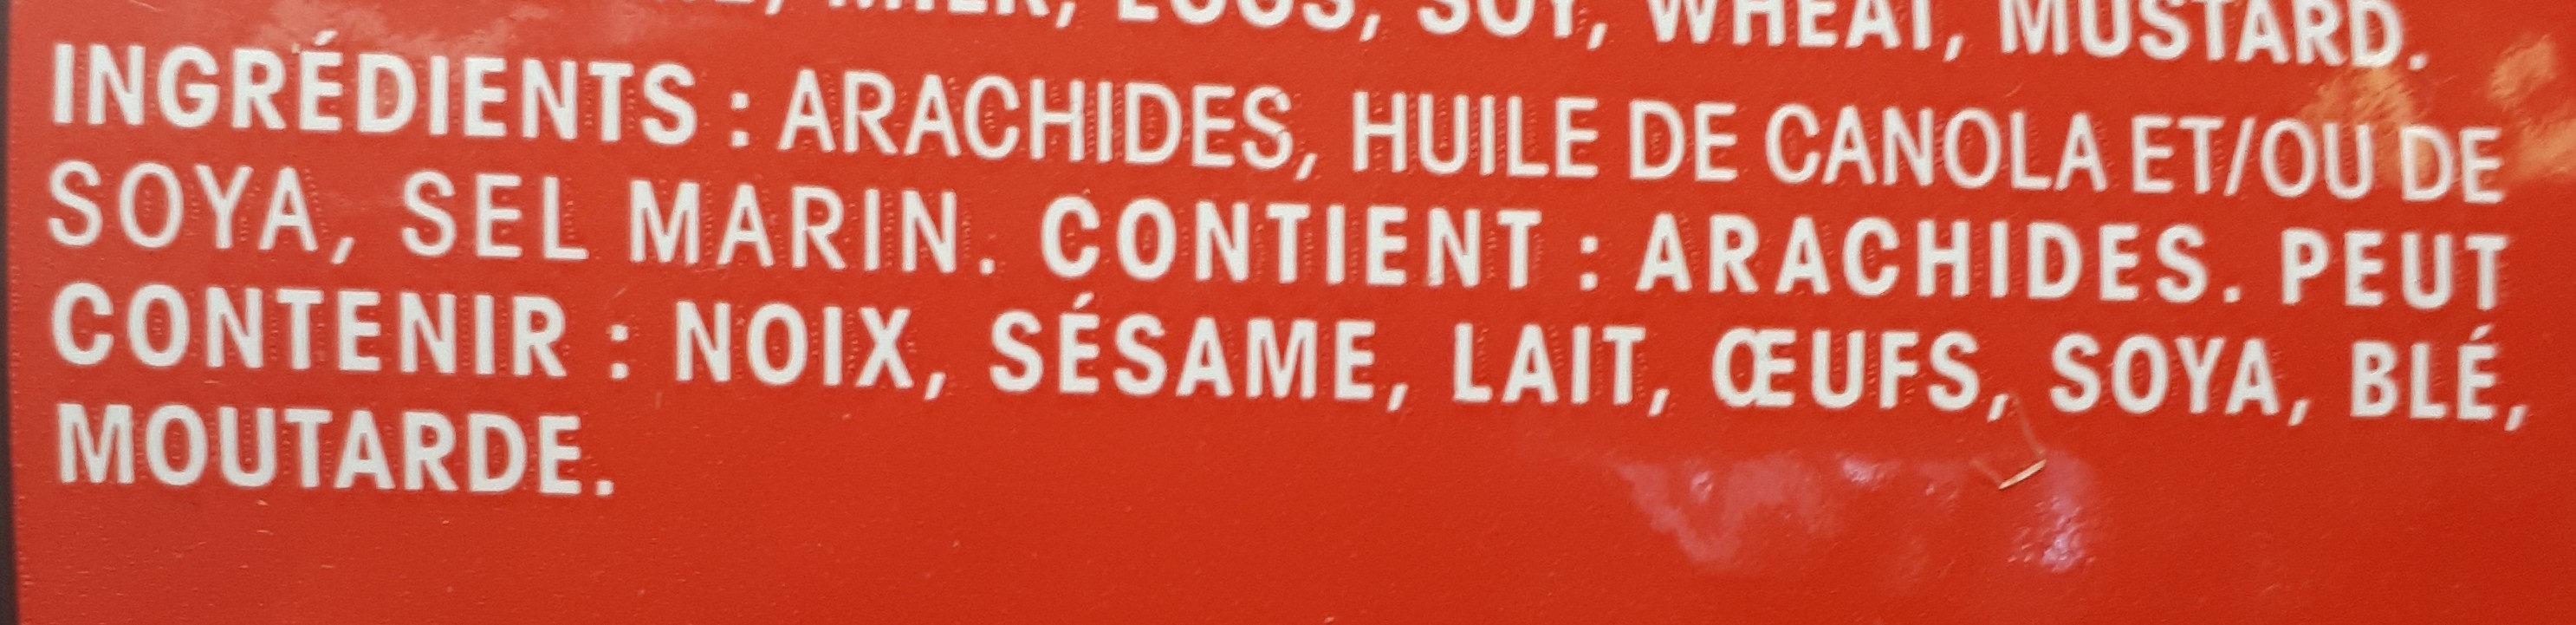 arachides rôties et salées - Ingrediënten - fr